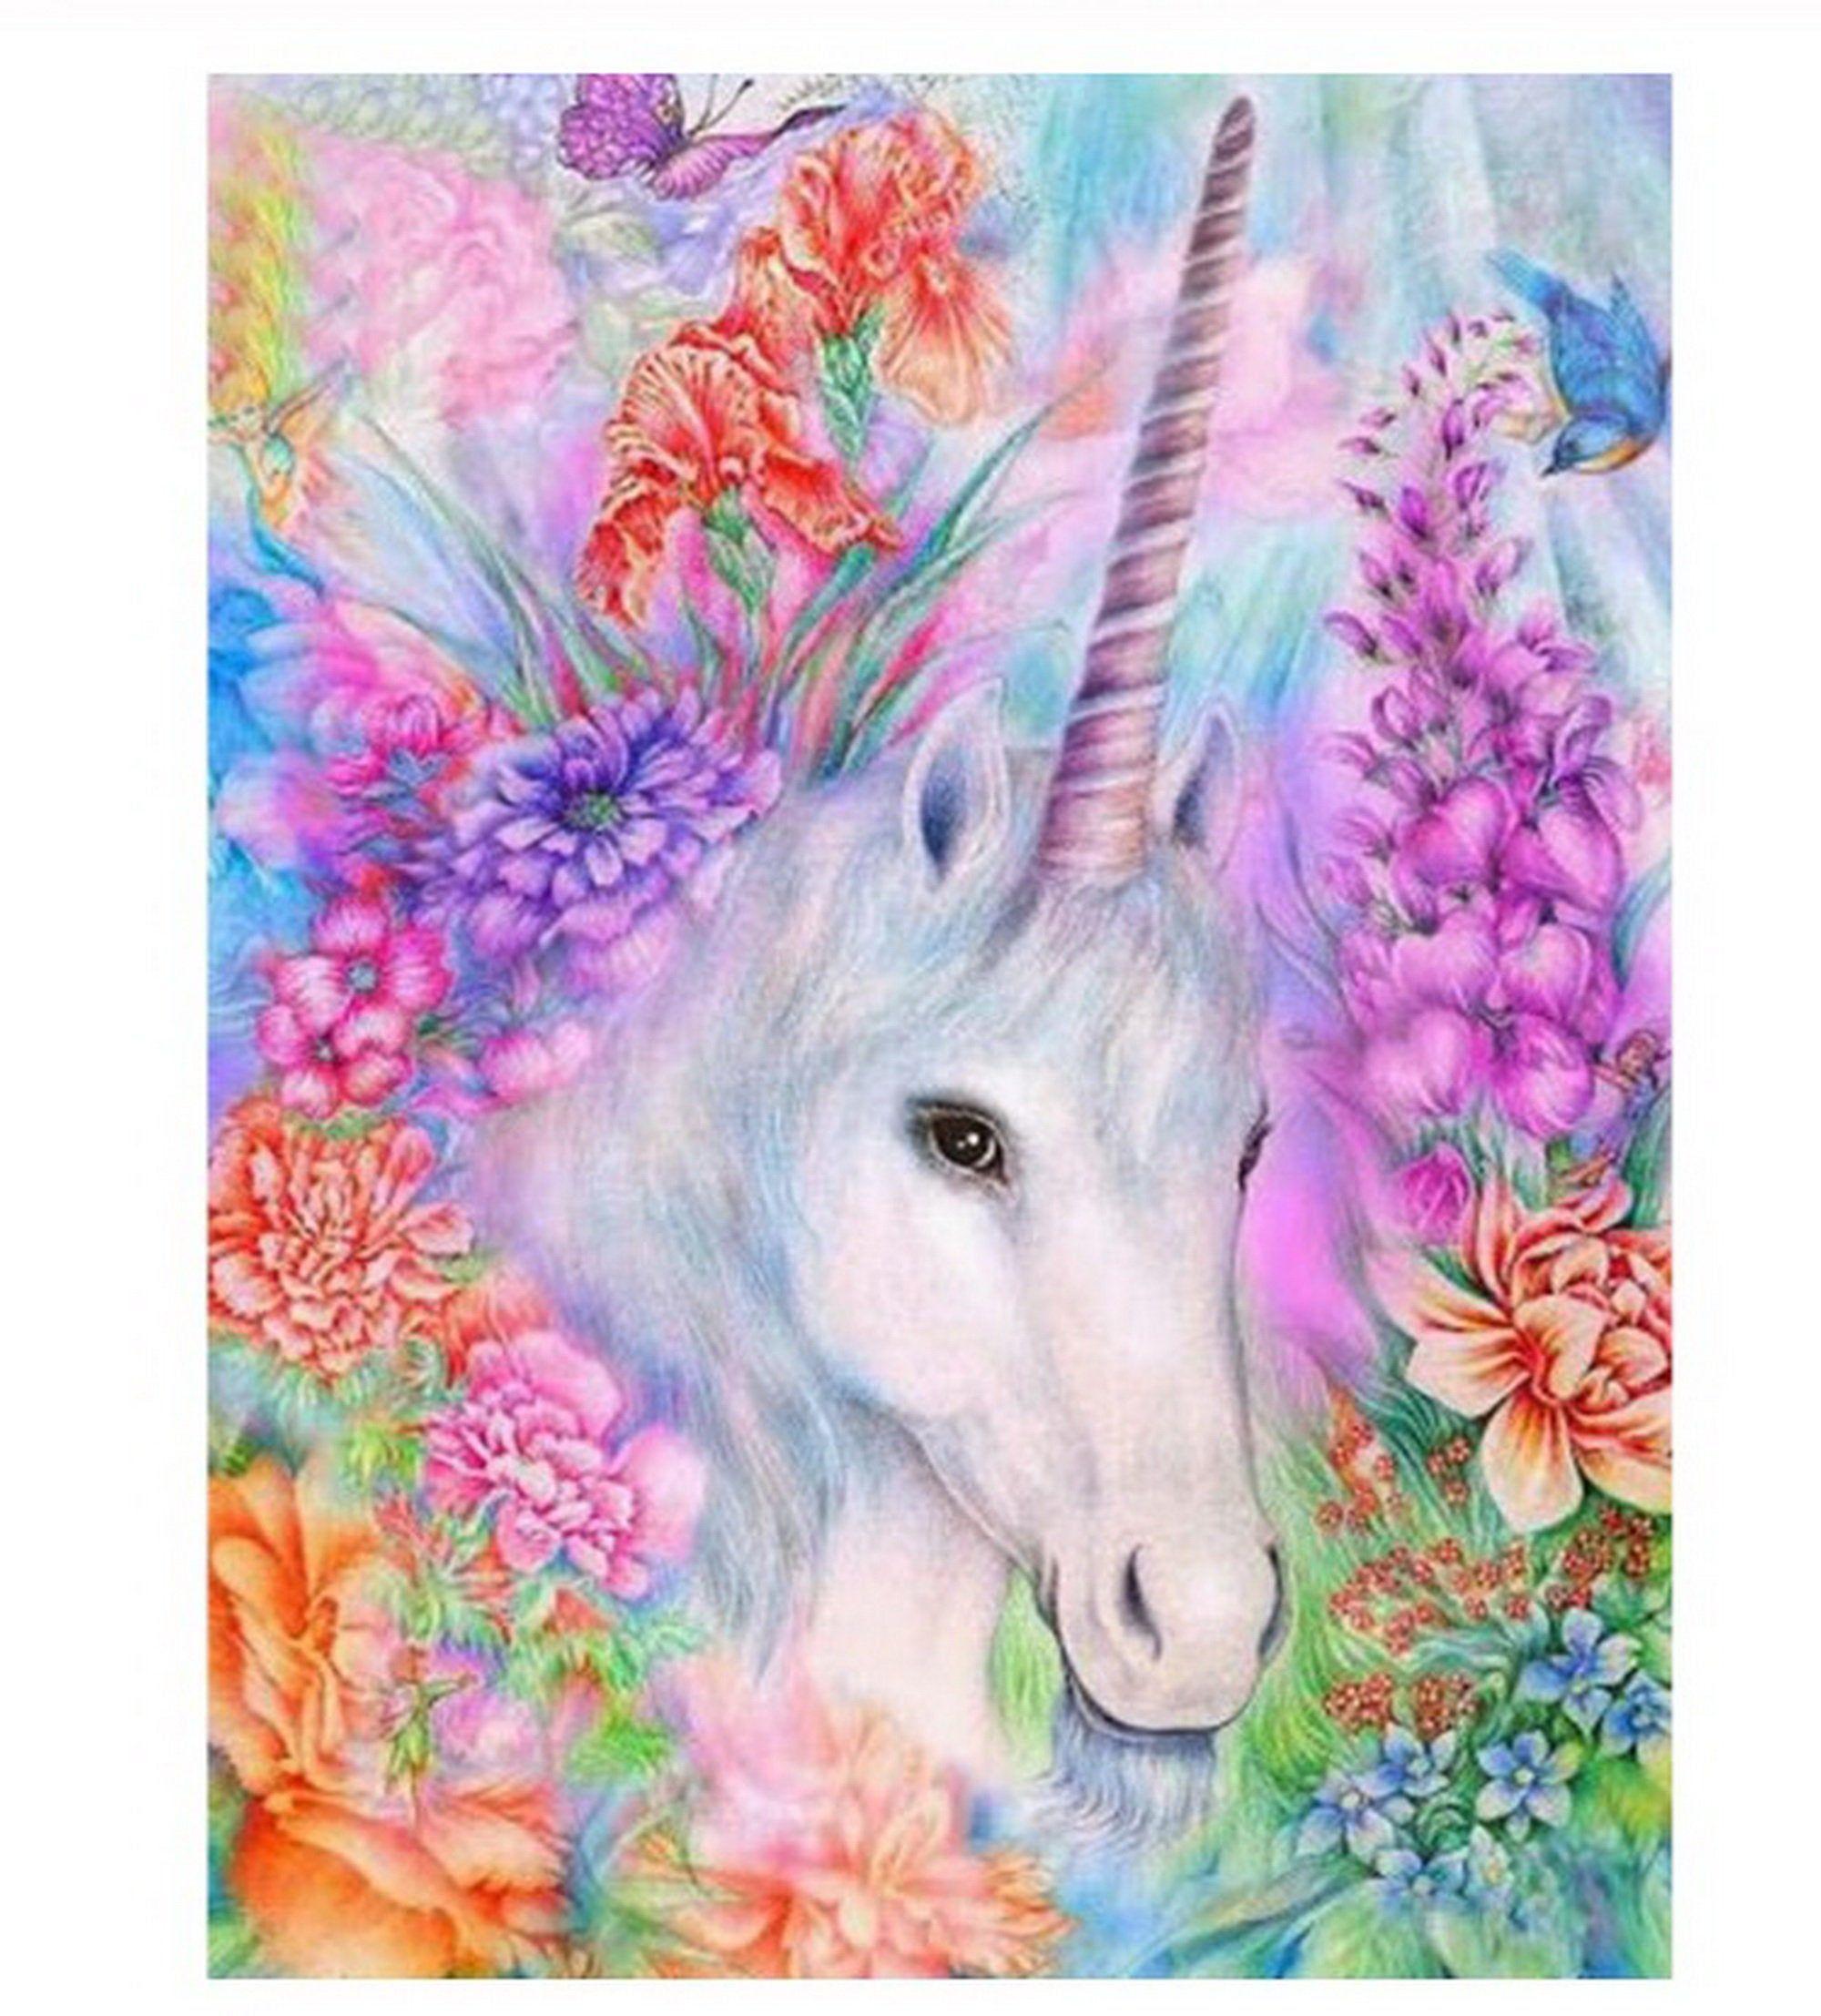 Unicorn Paint Number kit, Home Decoration, Color by Number kit, Modern Paint by Number, DIY Painting On Canvas, DIY Painting Kit